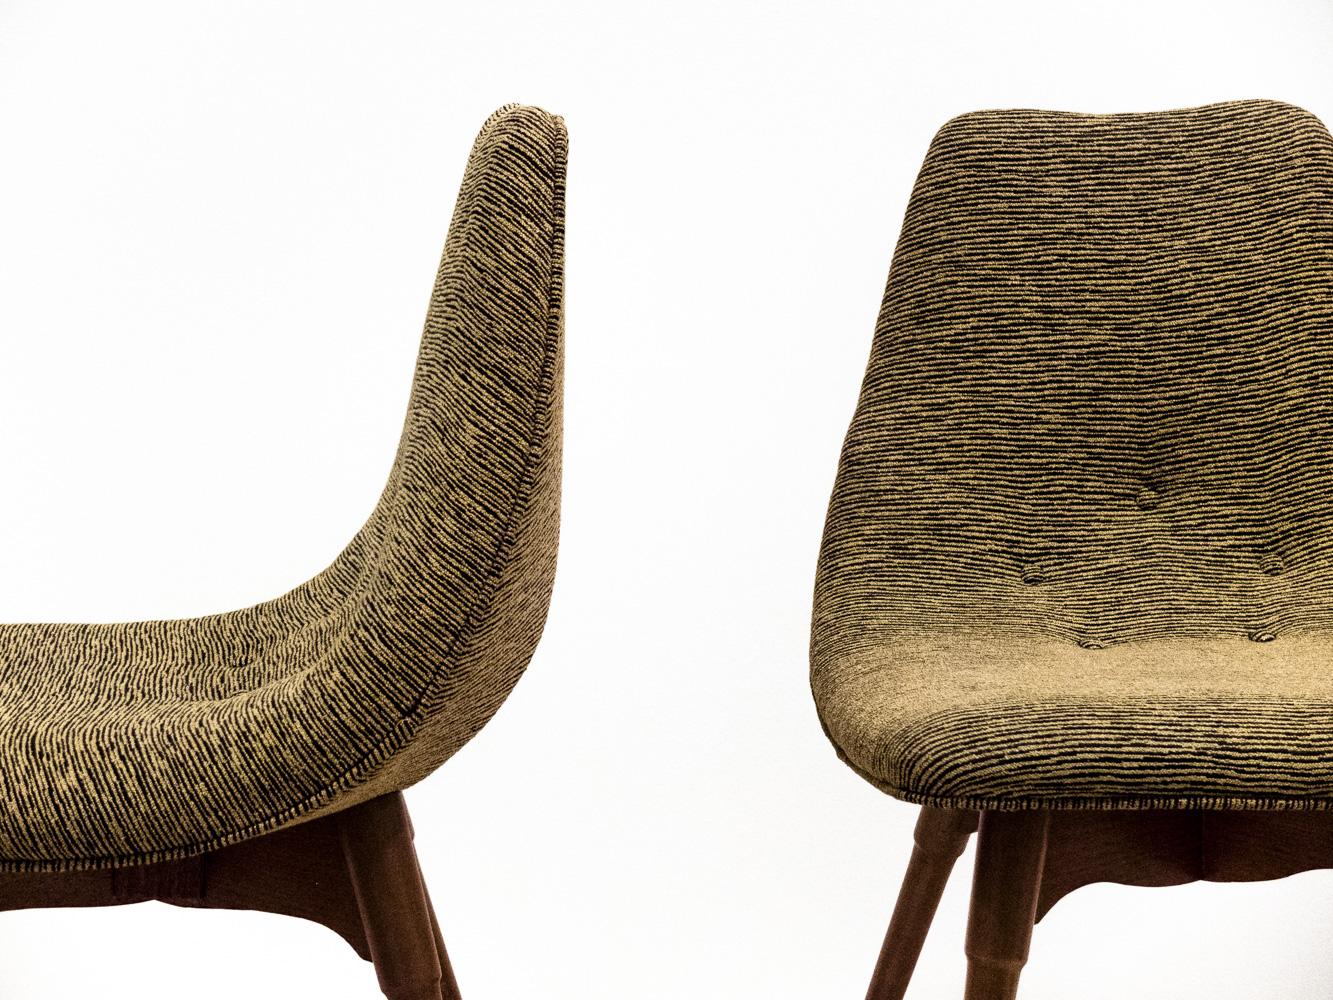 Heide Featherston Exhibition Cantilever Interiors Furniture Design (62).JPG